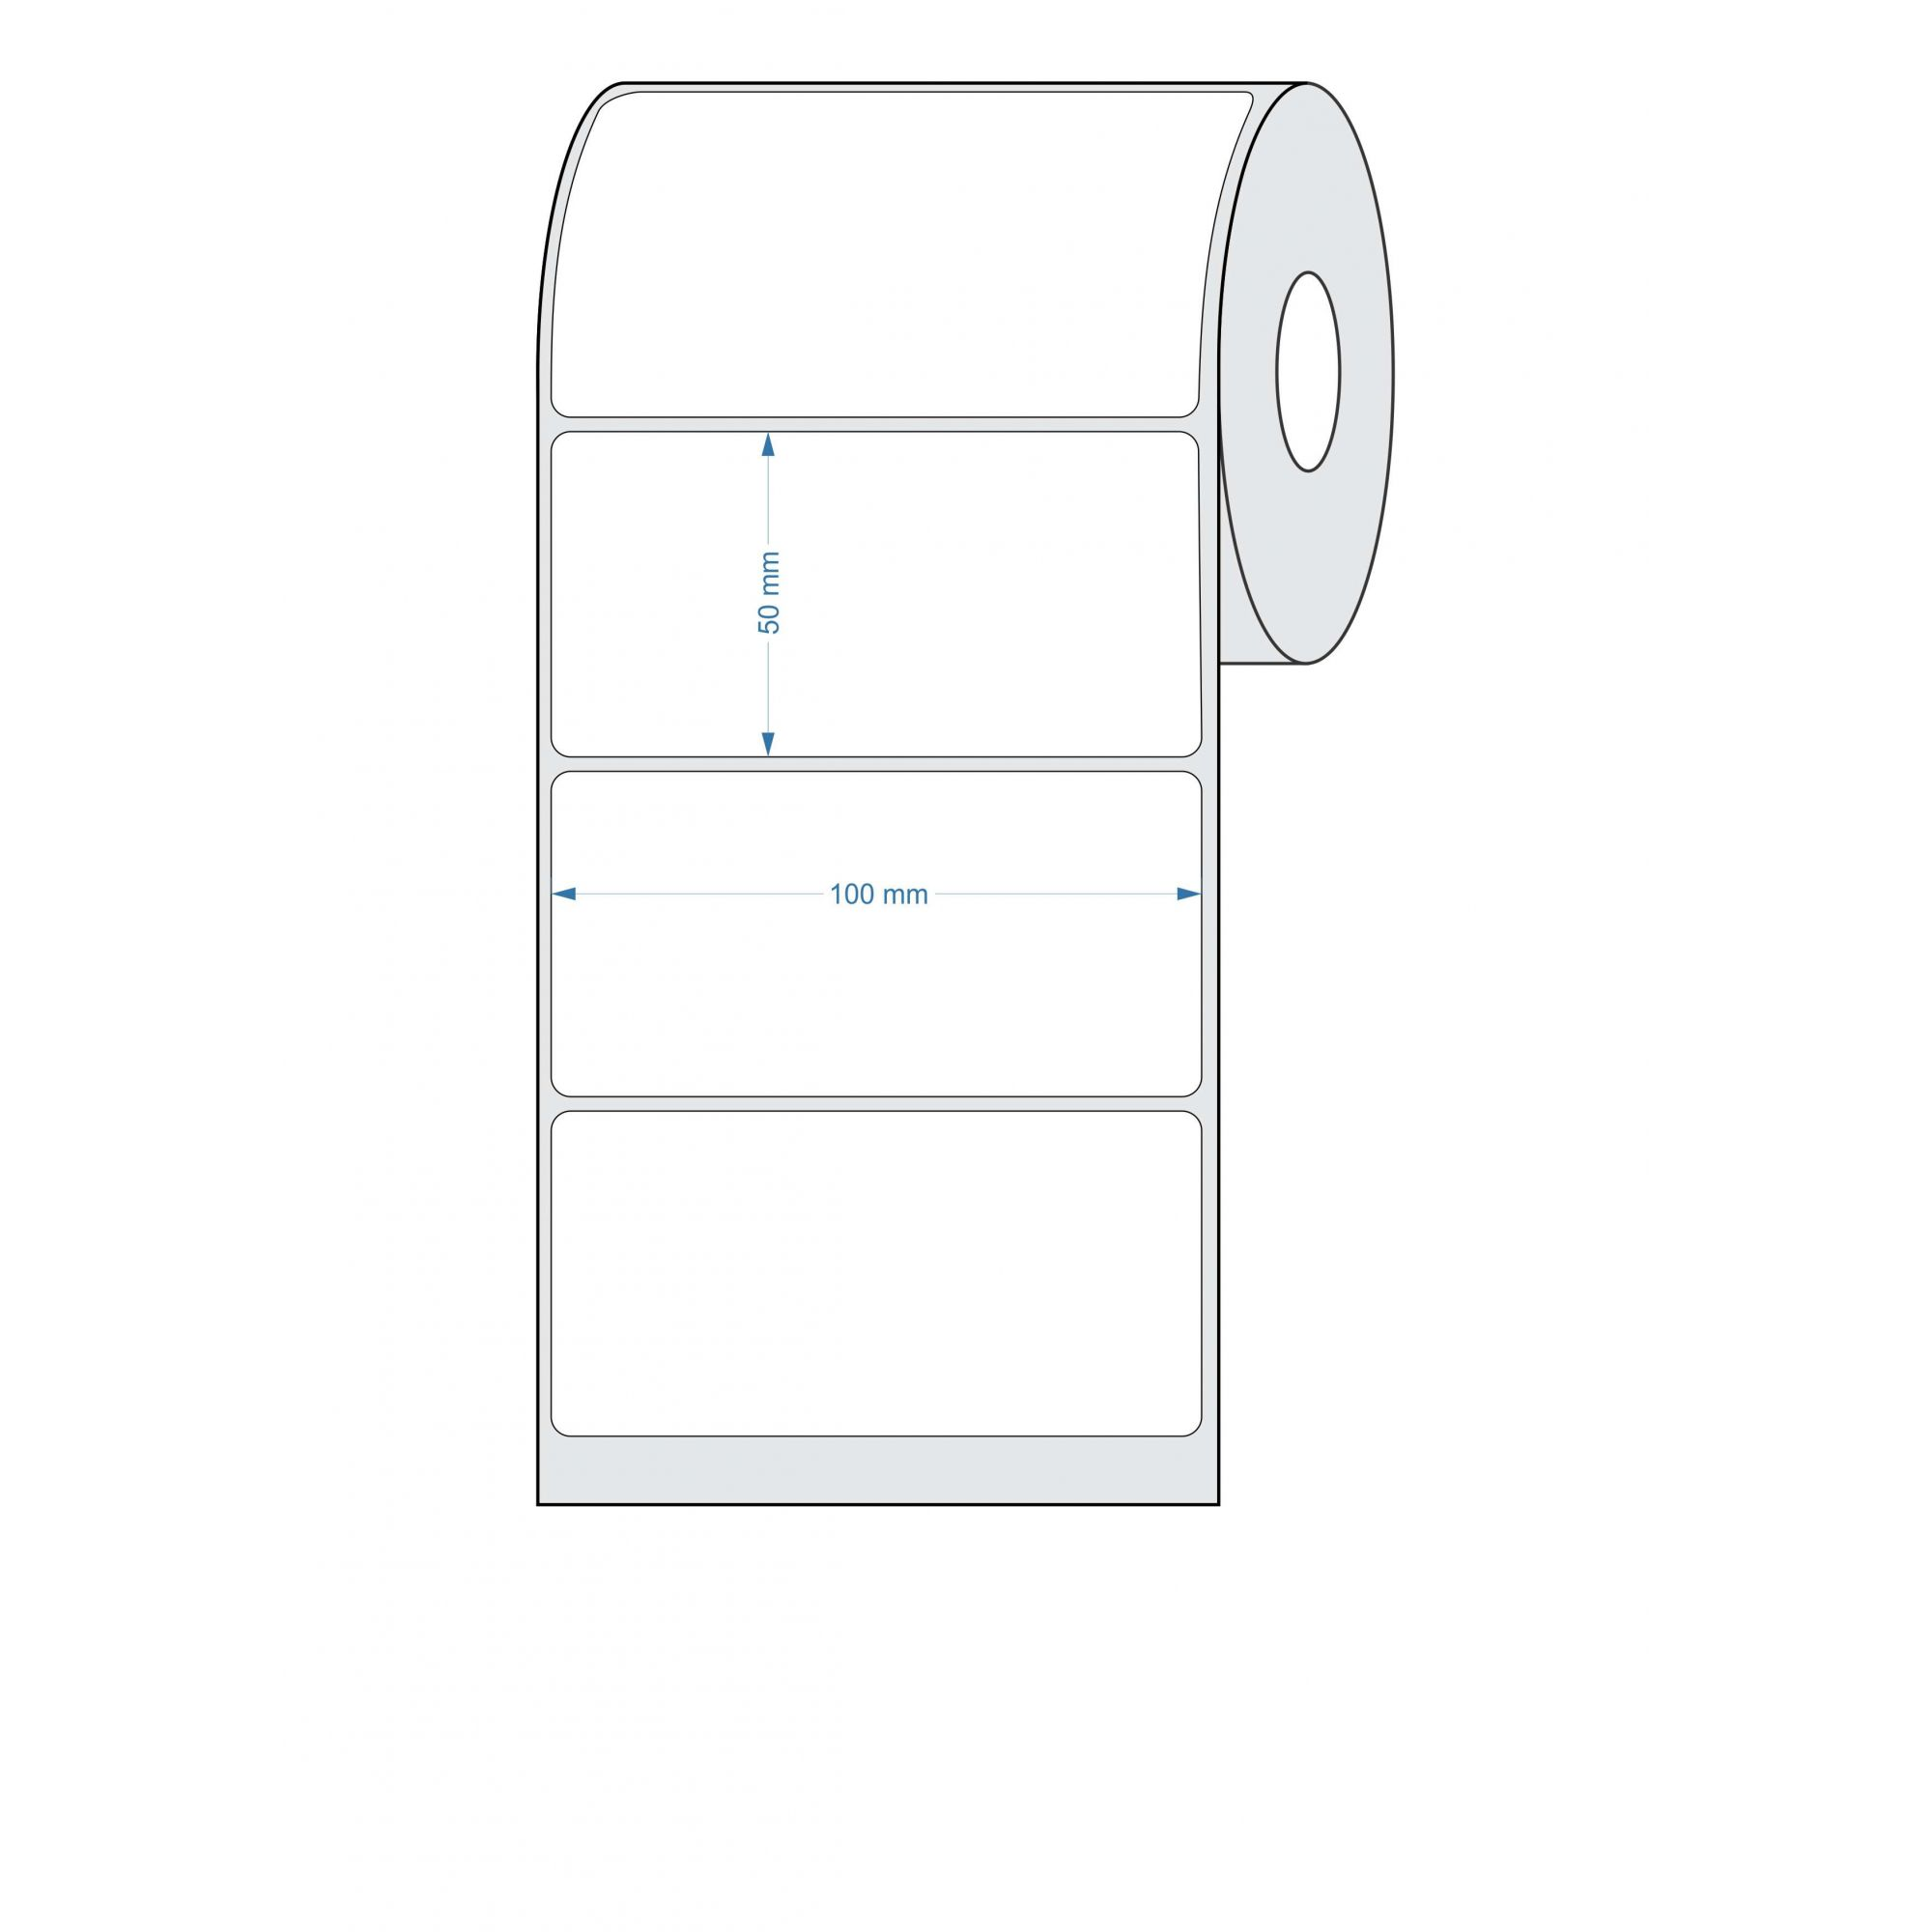 12 Rolos Etiquetas Adesivas Térmica 100x50 Mm 32 Metros